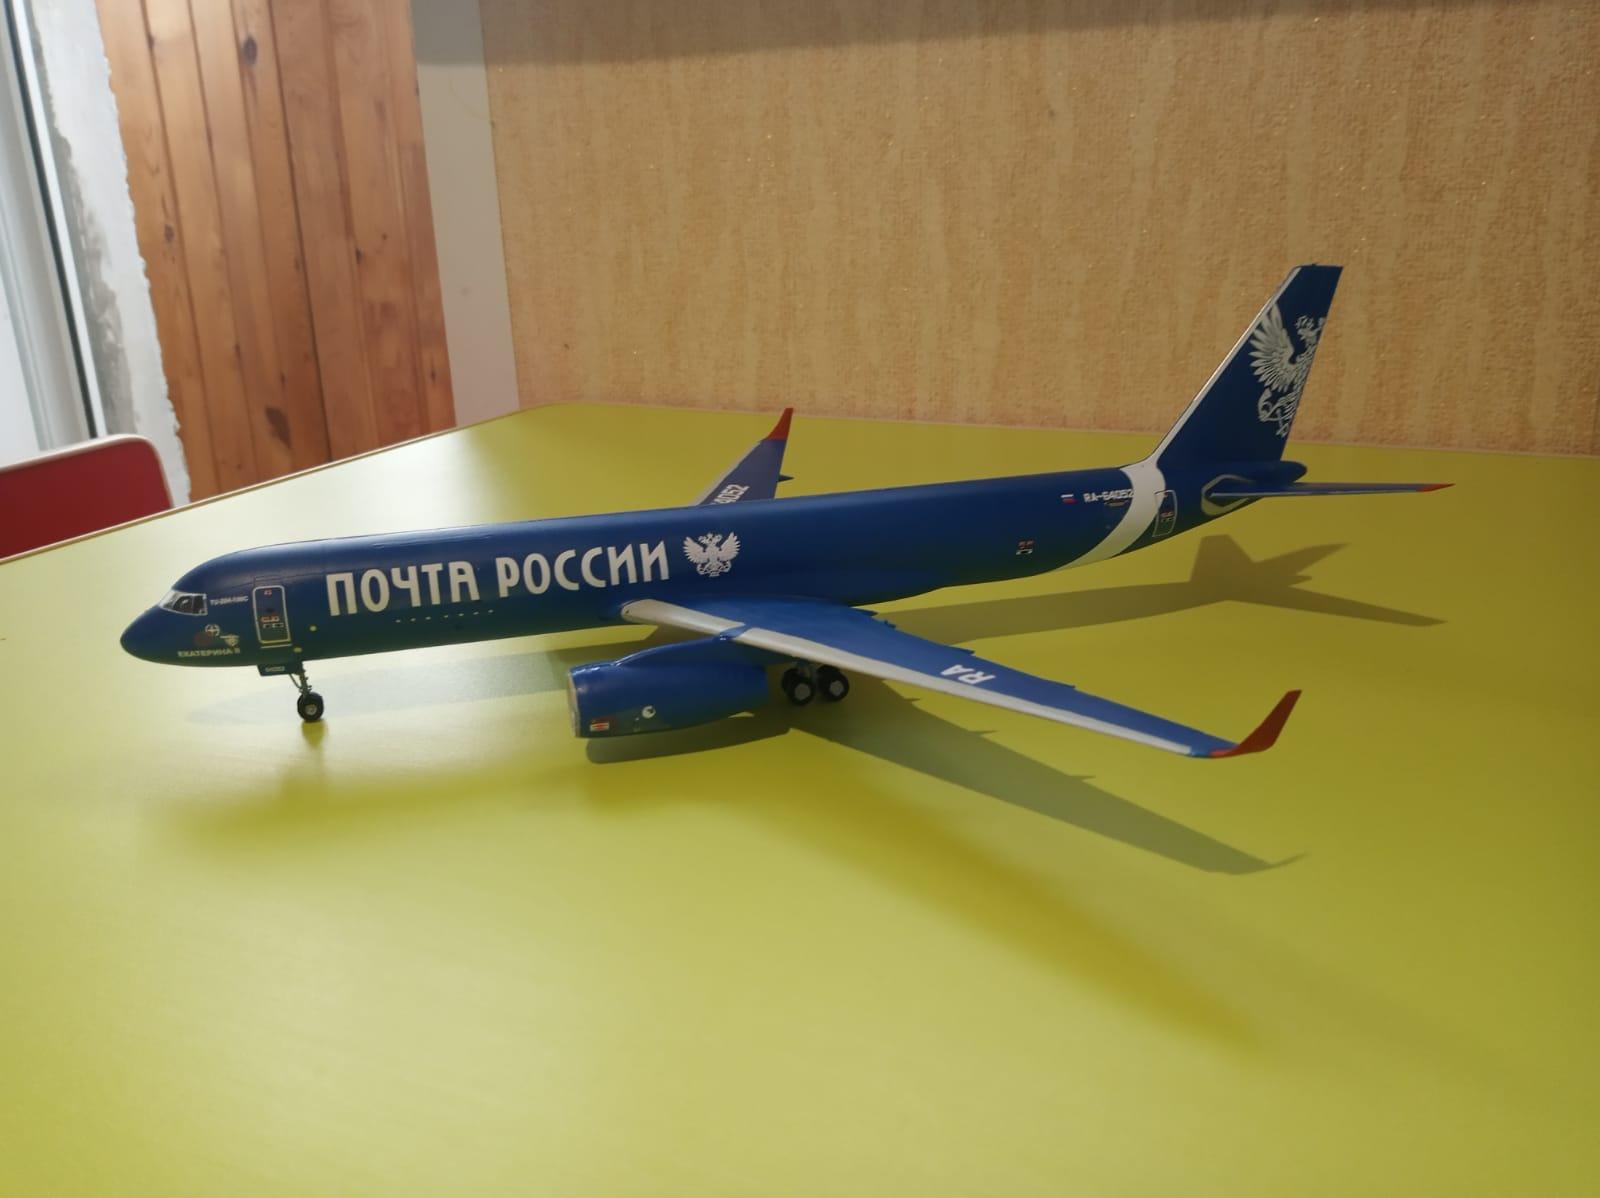 7022 Ту-204 Почта России Звезда, 1/144 Img-20210826-wa0002